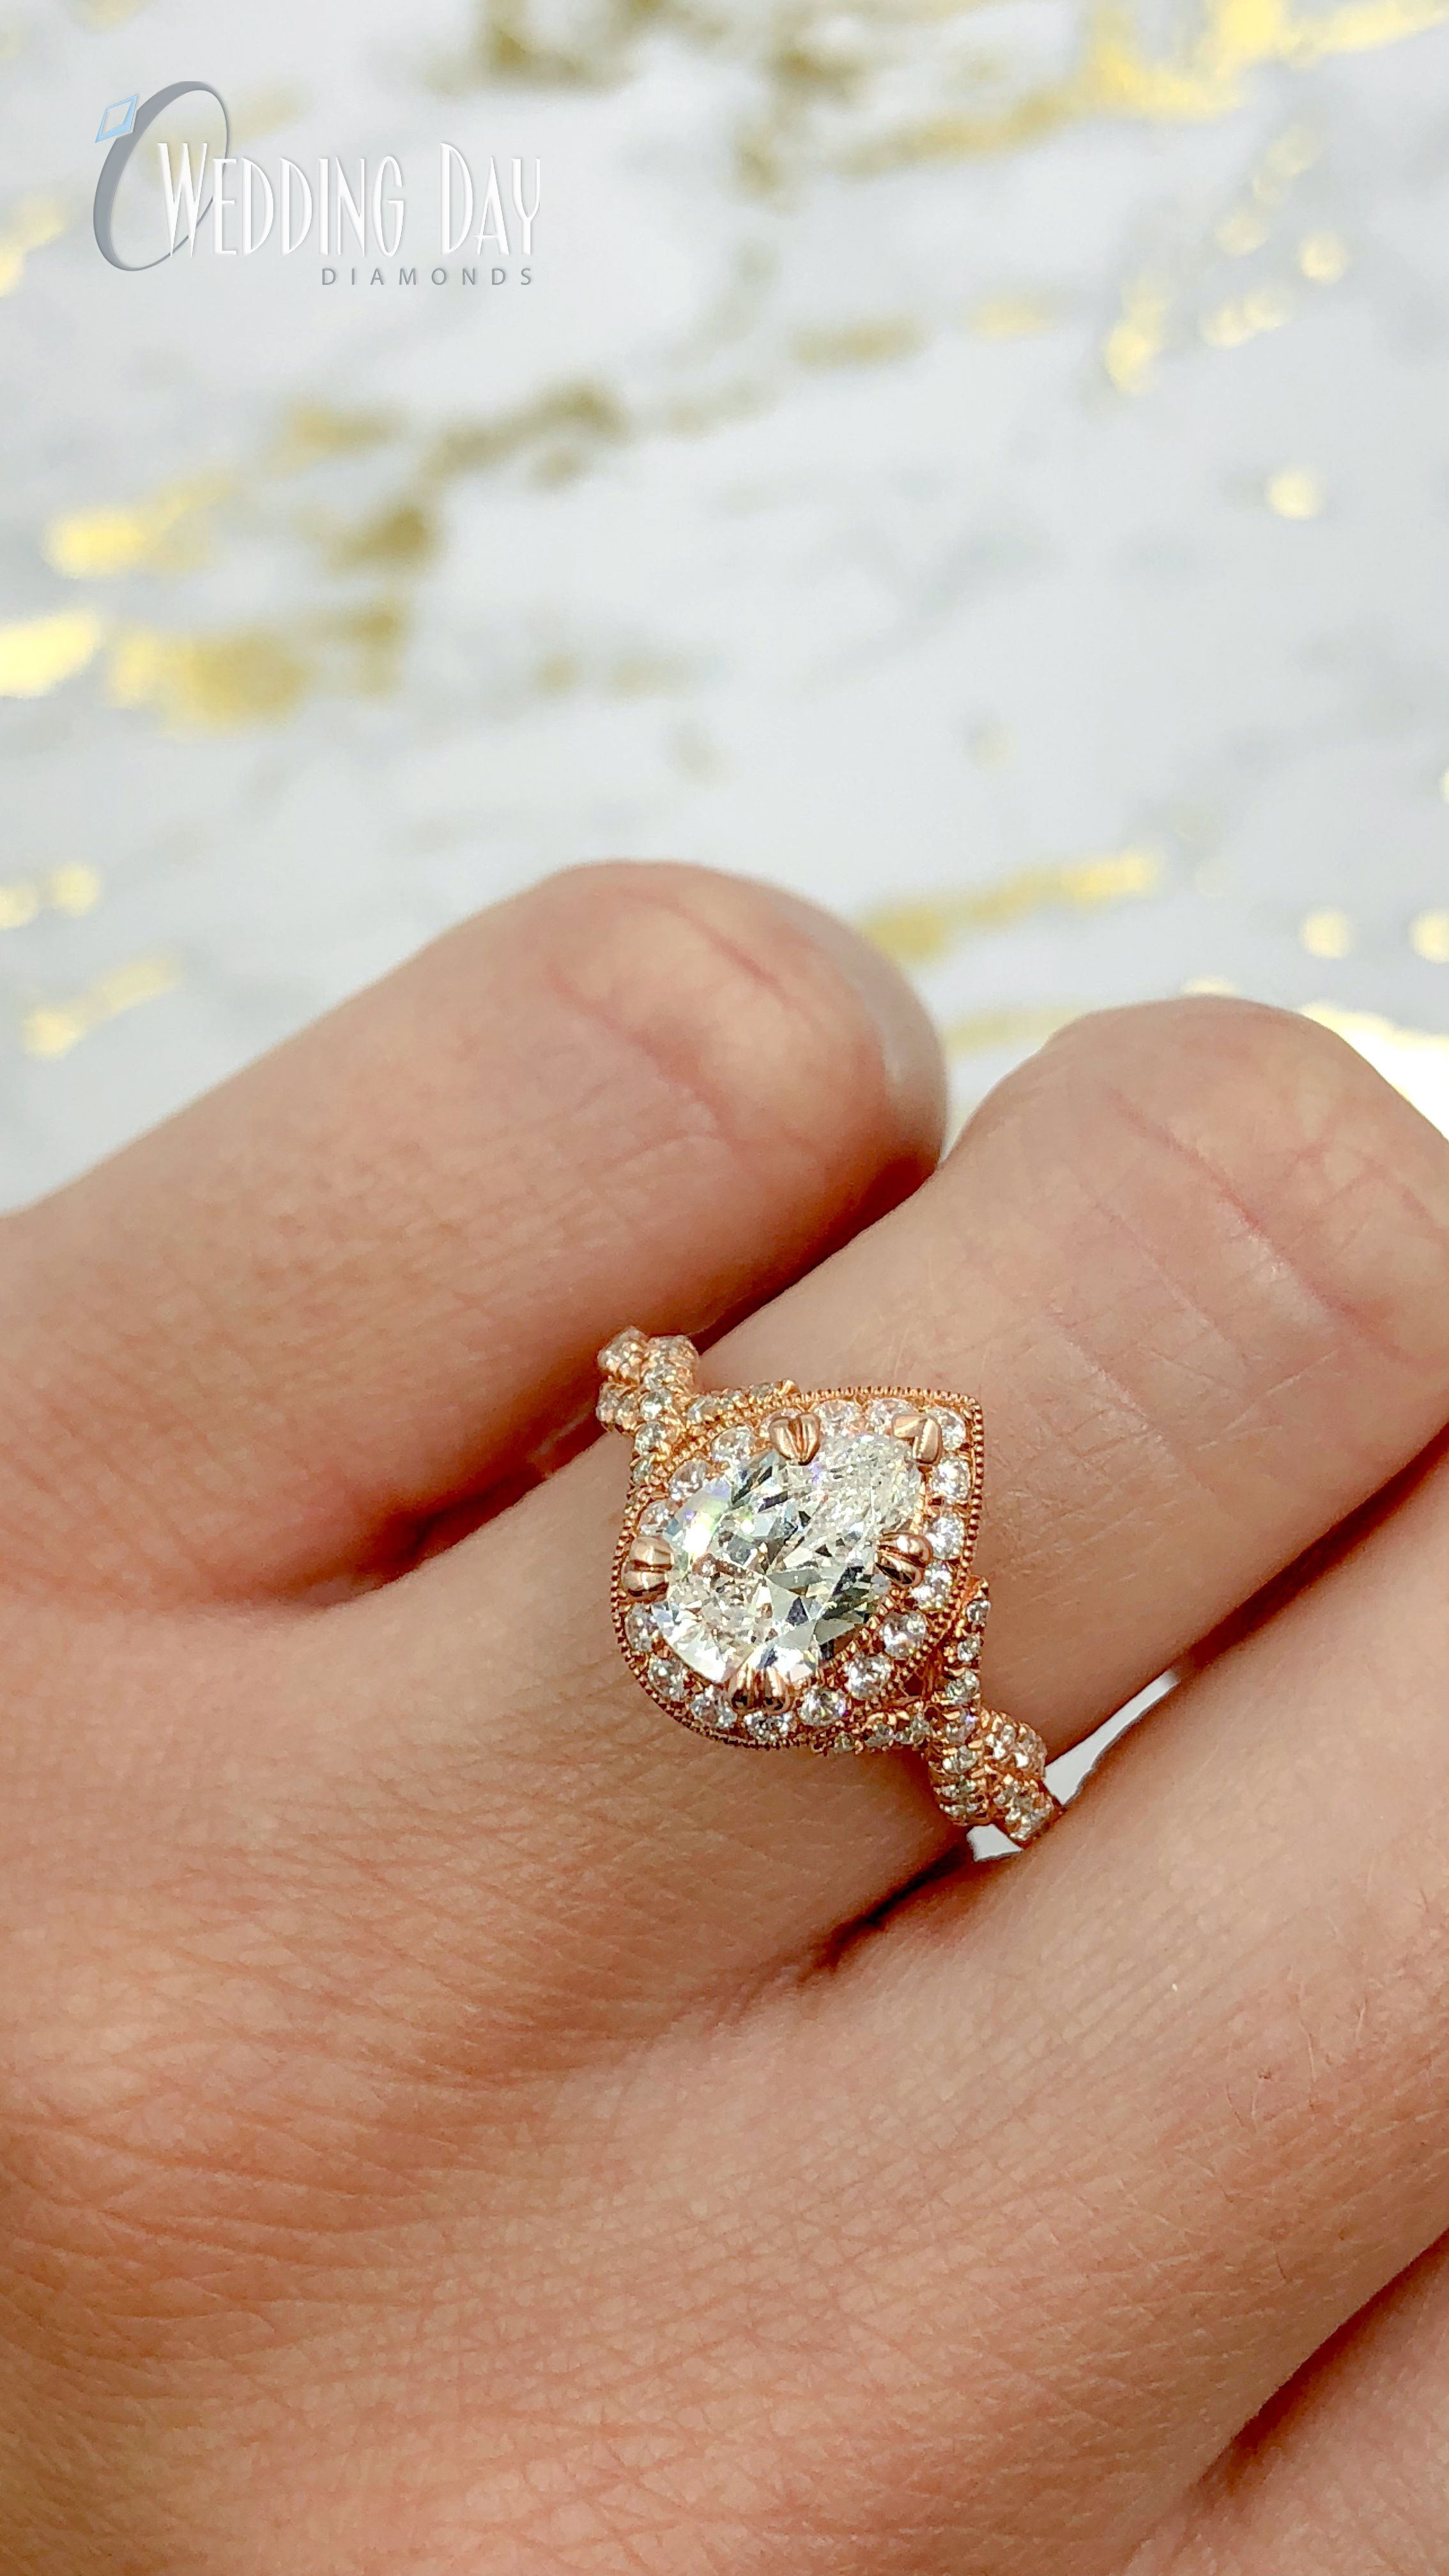 Rose Gold Pear Shape Vintage Style Diamond Halo Engagement Ring Rose Gold Pear Engagement Ring Pear Engagement Ring Halo Engagement Rings Twisted